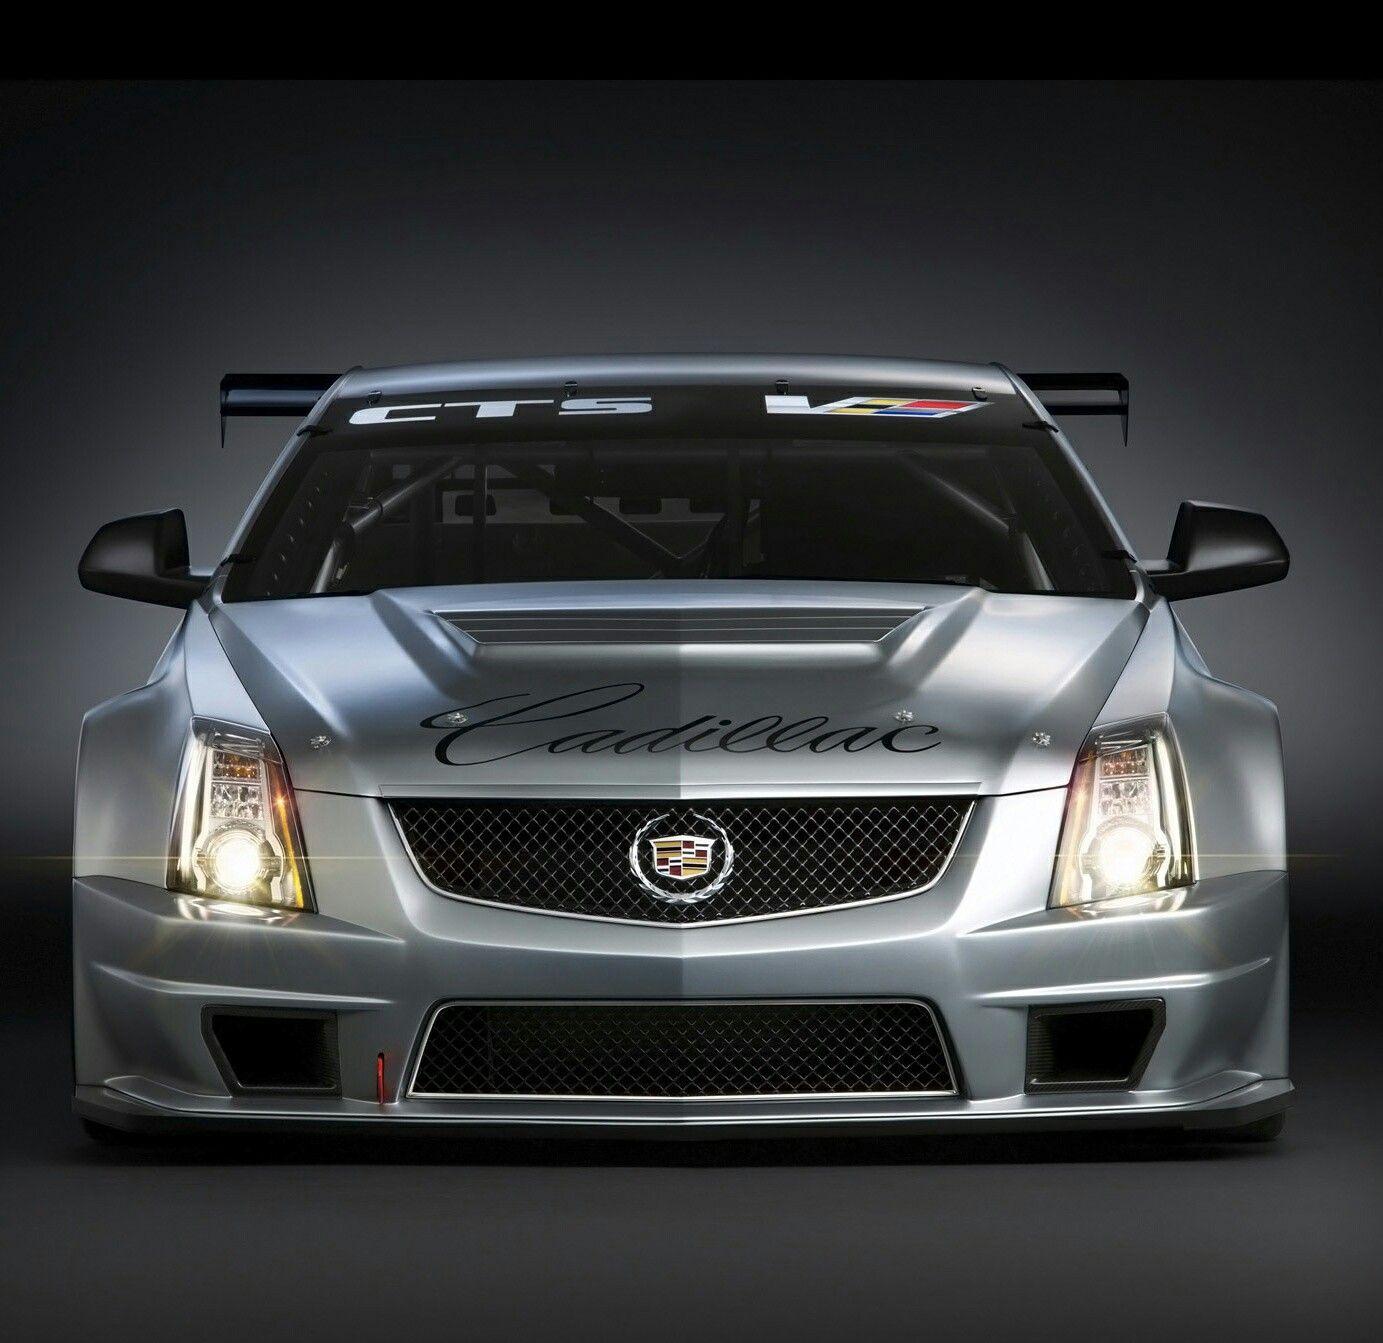 Hennessey Hpe1000 Cadillac Cts V Sedan: Pin On Auto Aficionado (°!°